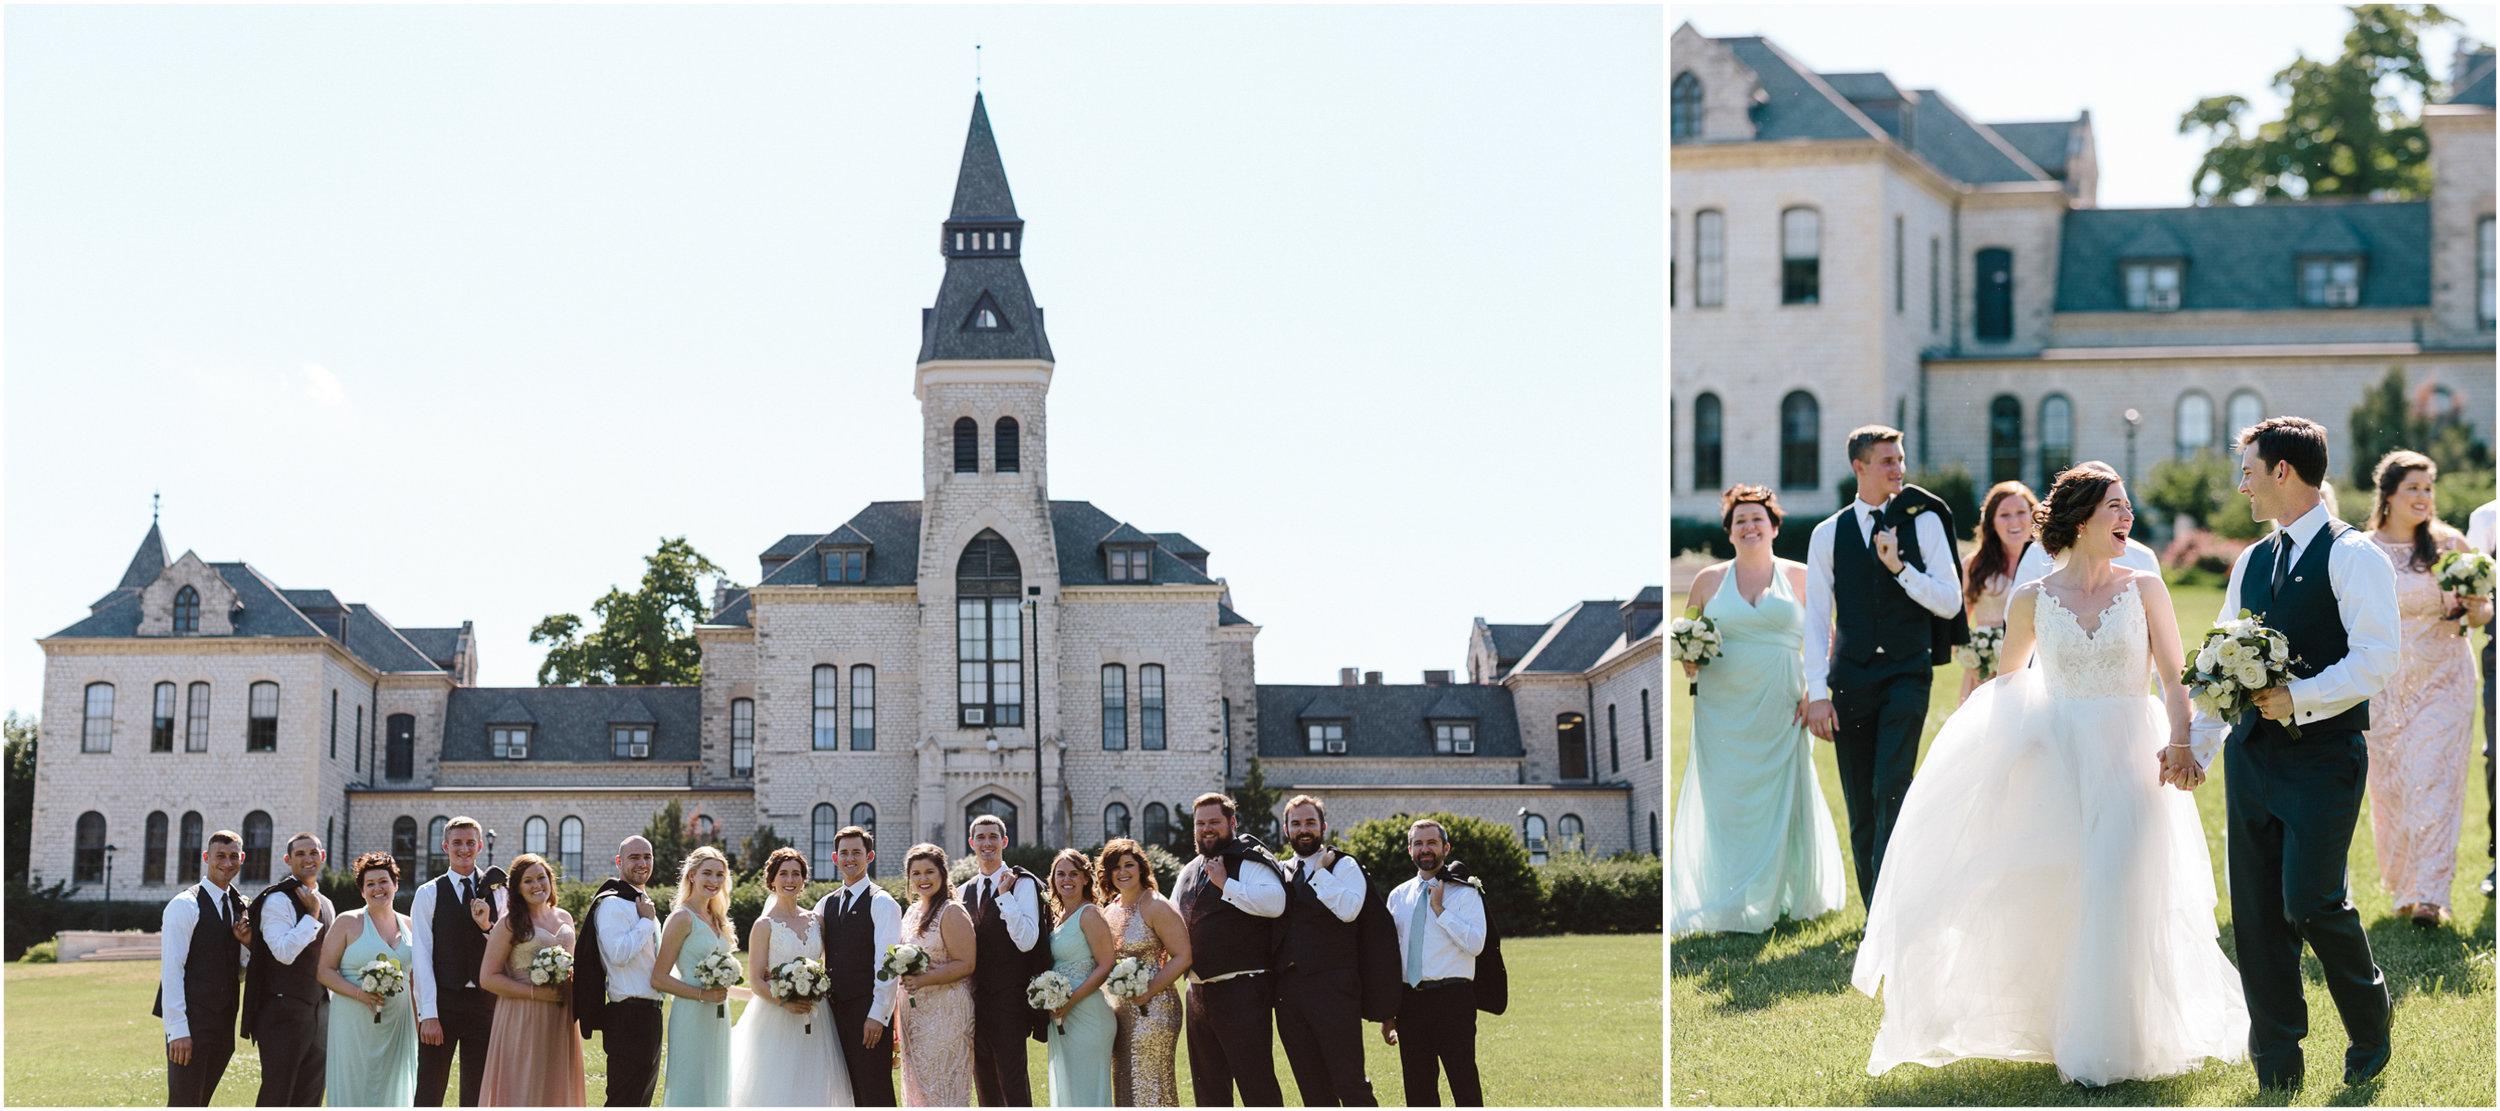 alyssa barletter photography manhattan kansas wedding photos church country club gardens taylor and kirk-48.jpg